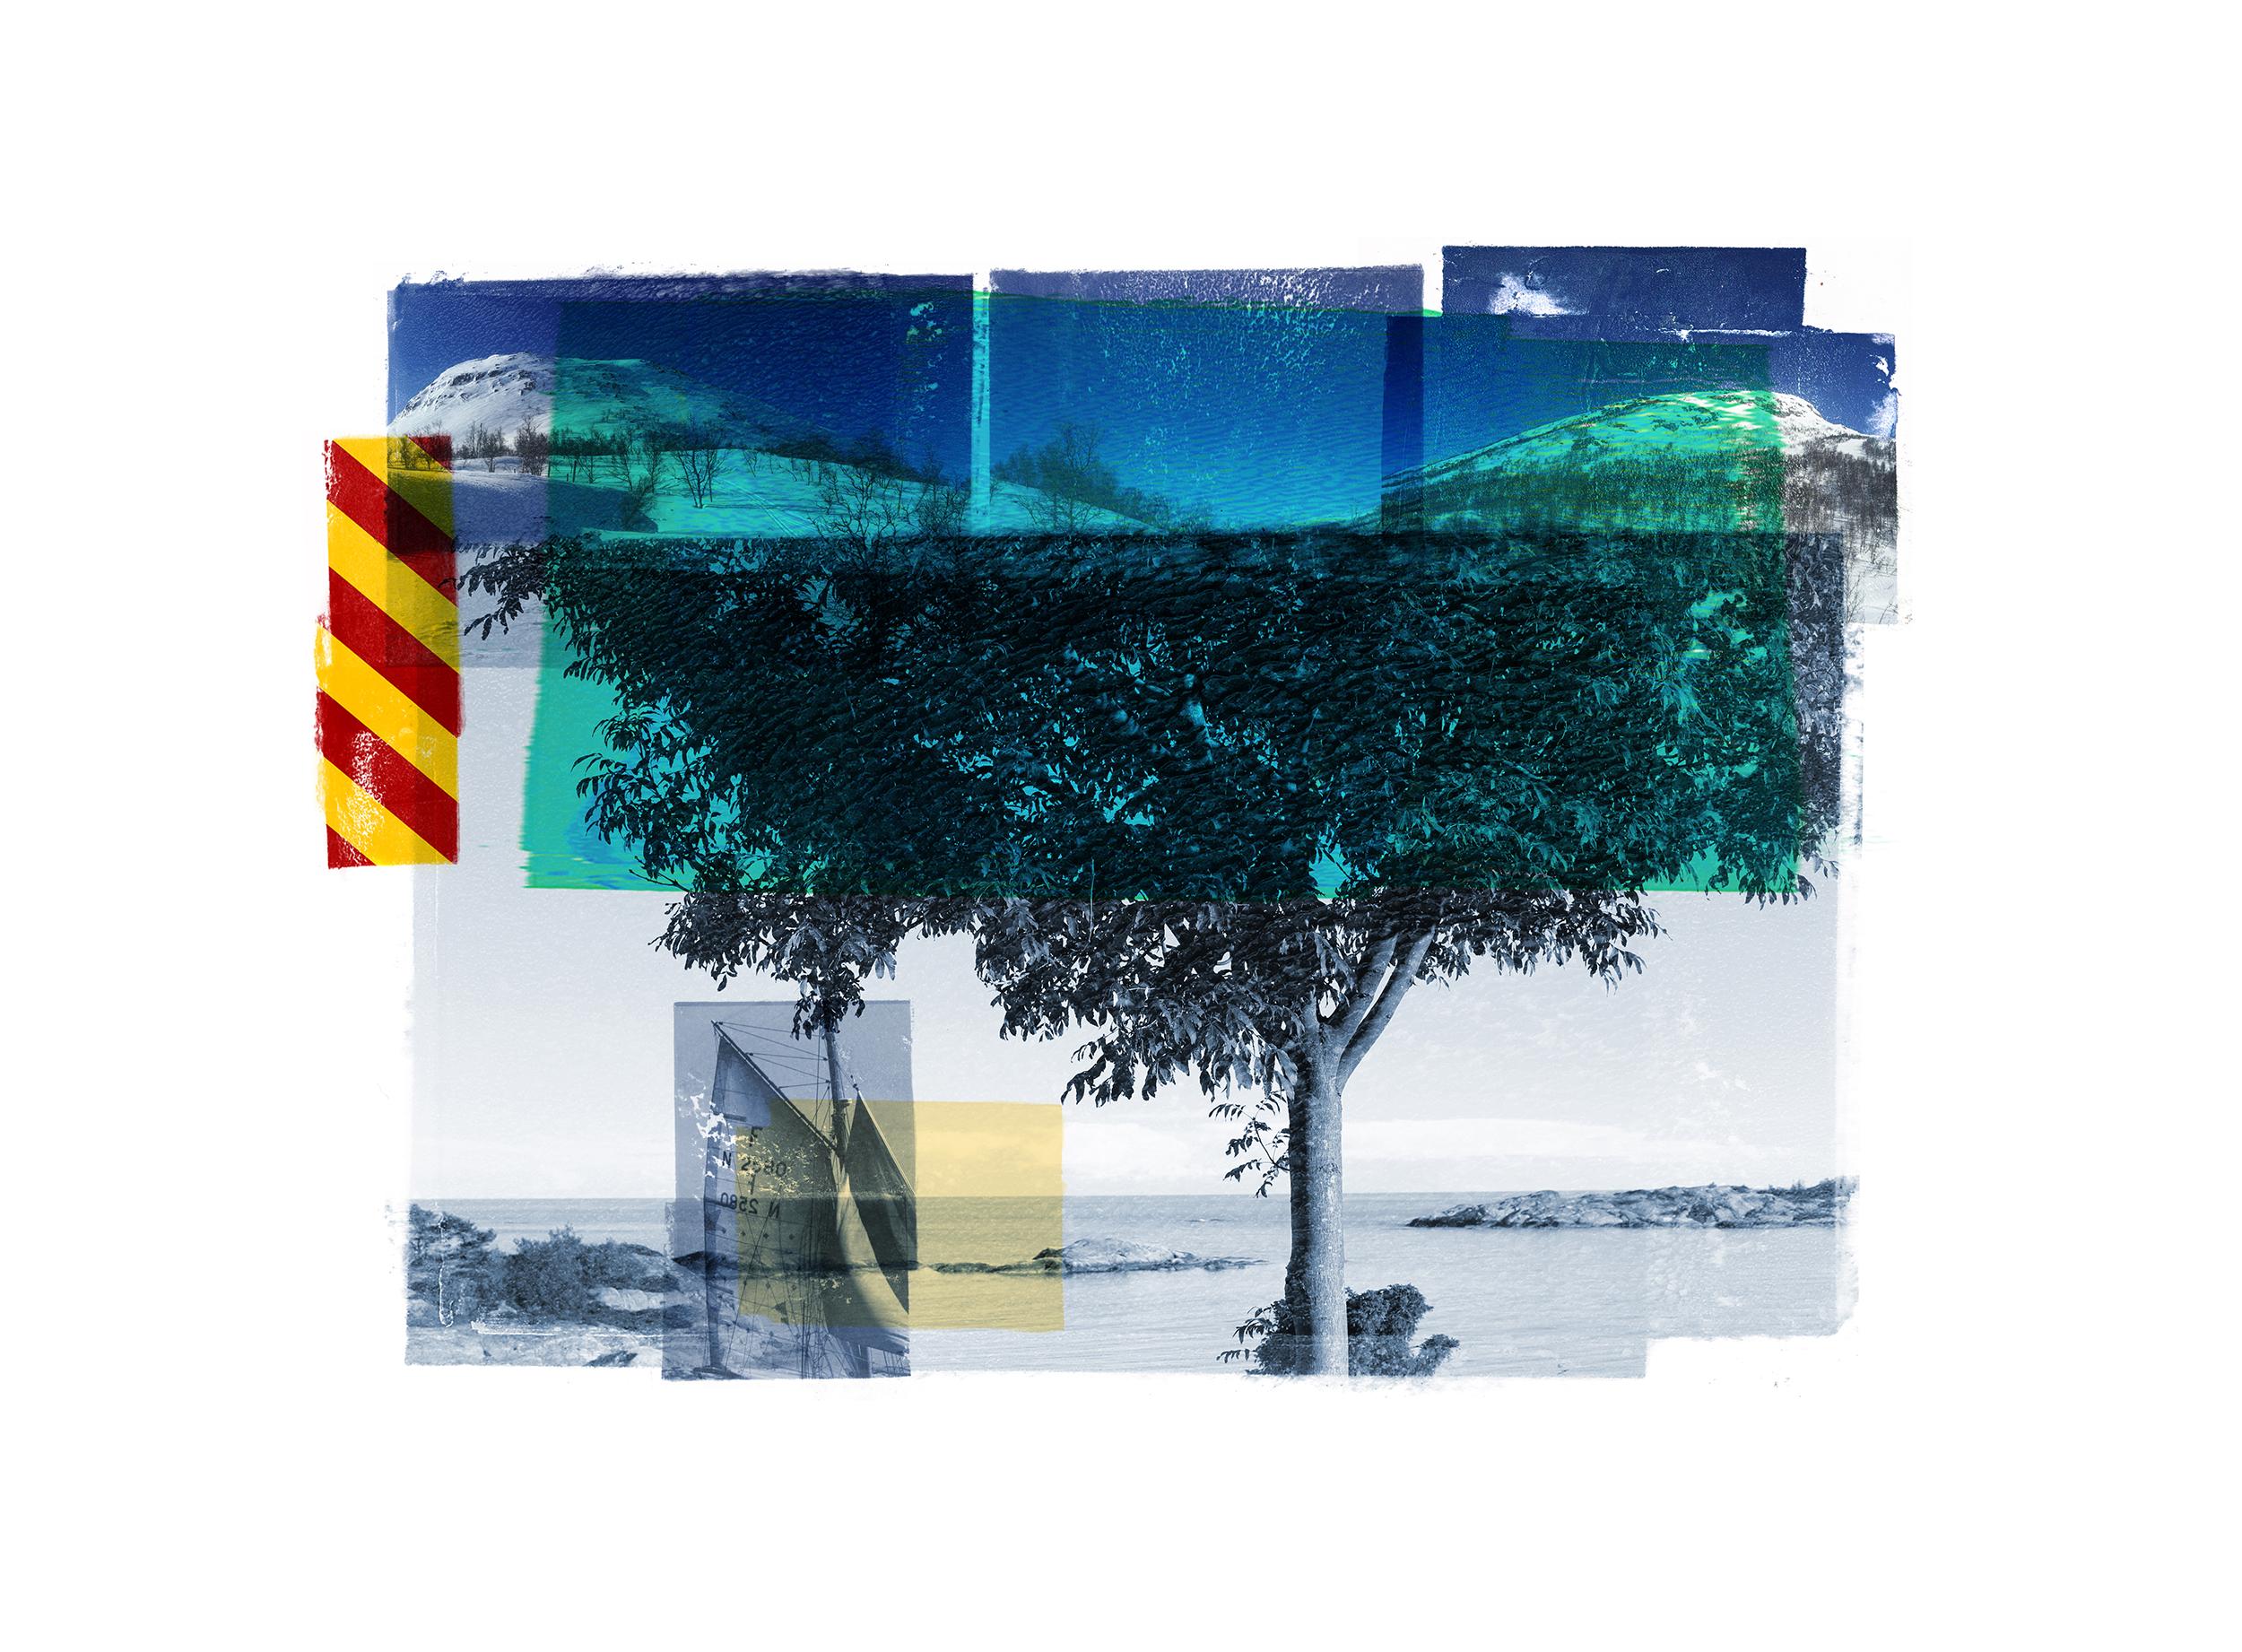 Blue Tree / Reservoir / Cyan   Original Archival UV Pigment Print / BFK Rives 250 gr 35 x 25 cm / 13,7 x 10 in Edition of 50 + 7 Ap Editeur: Per Fronth Studios / Printer Henrik Aunevik  09/2015: